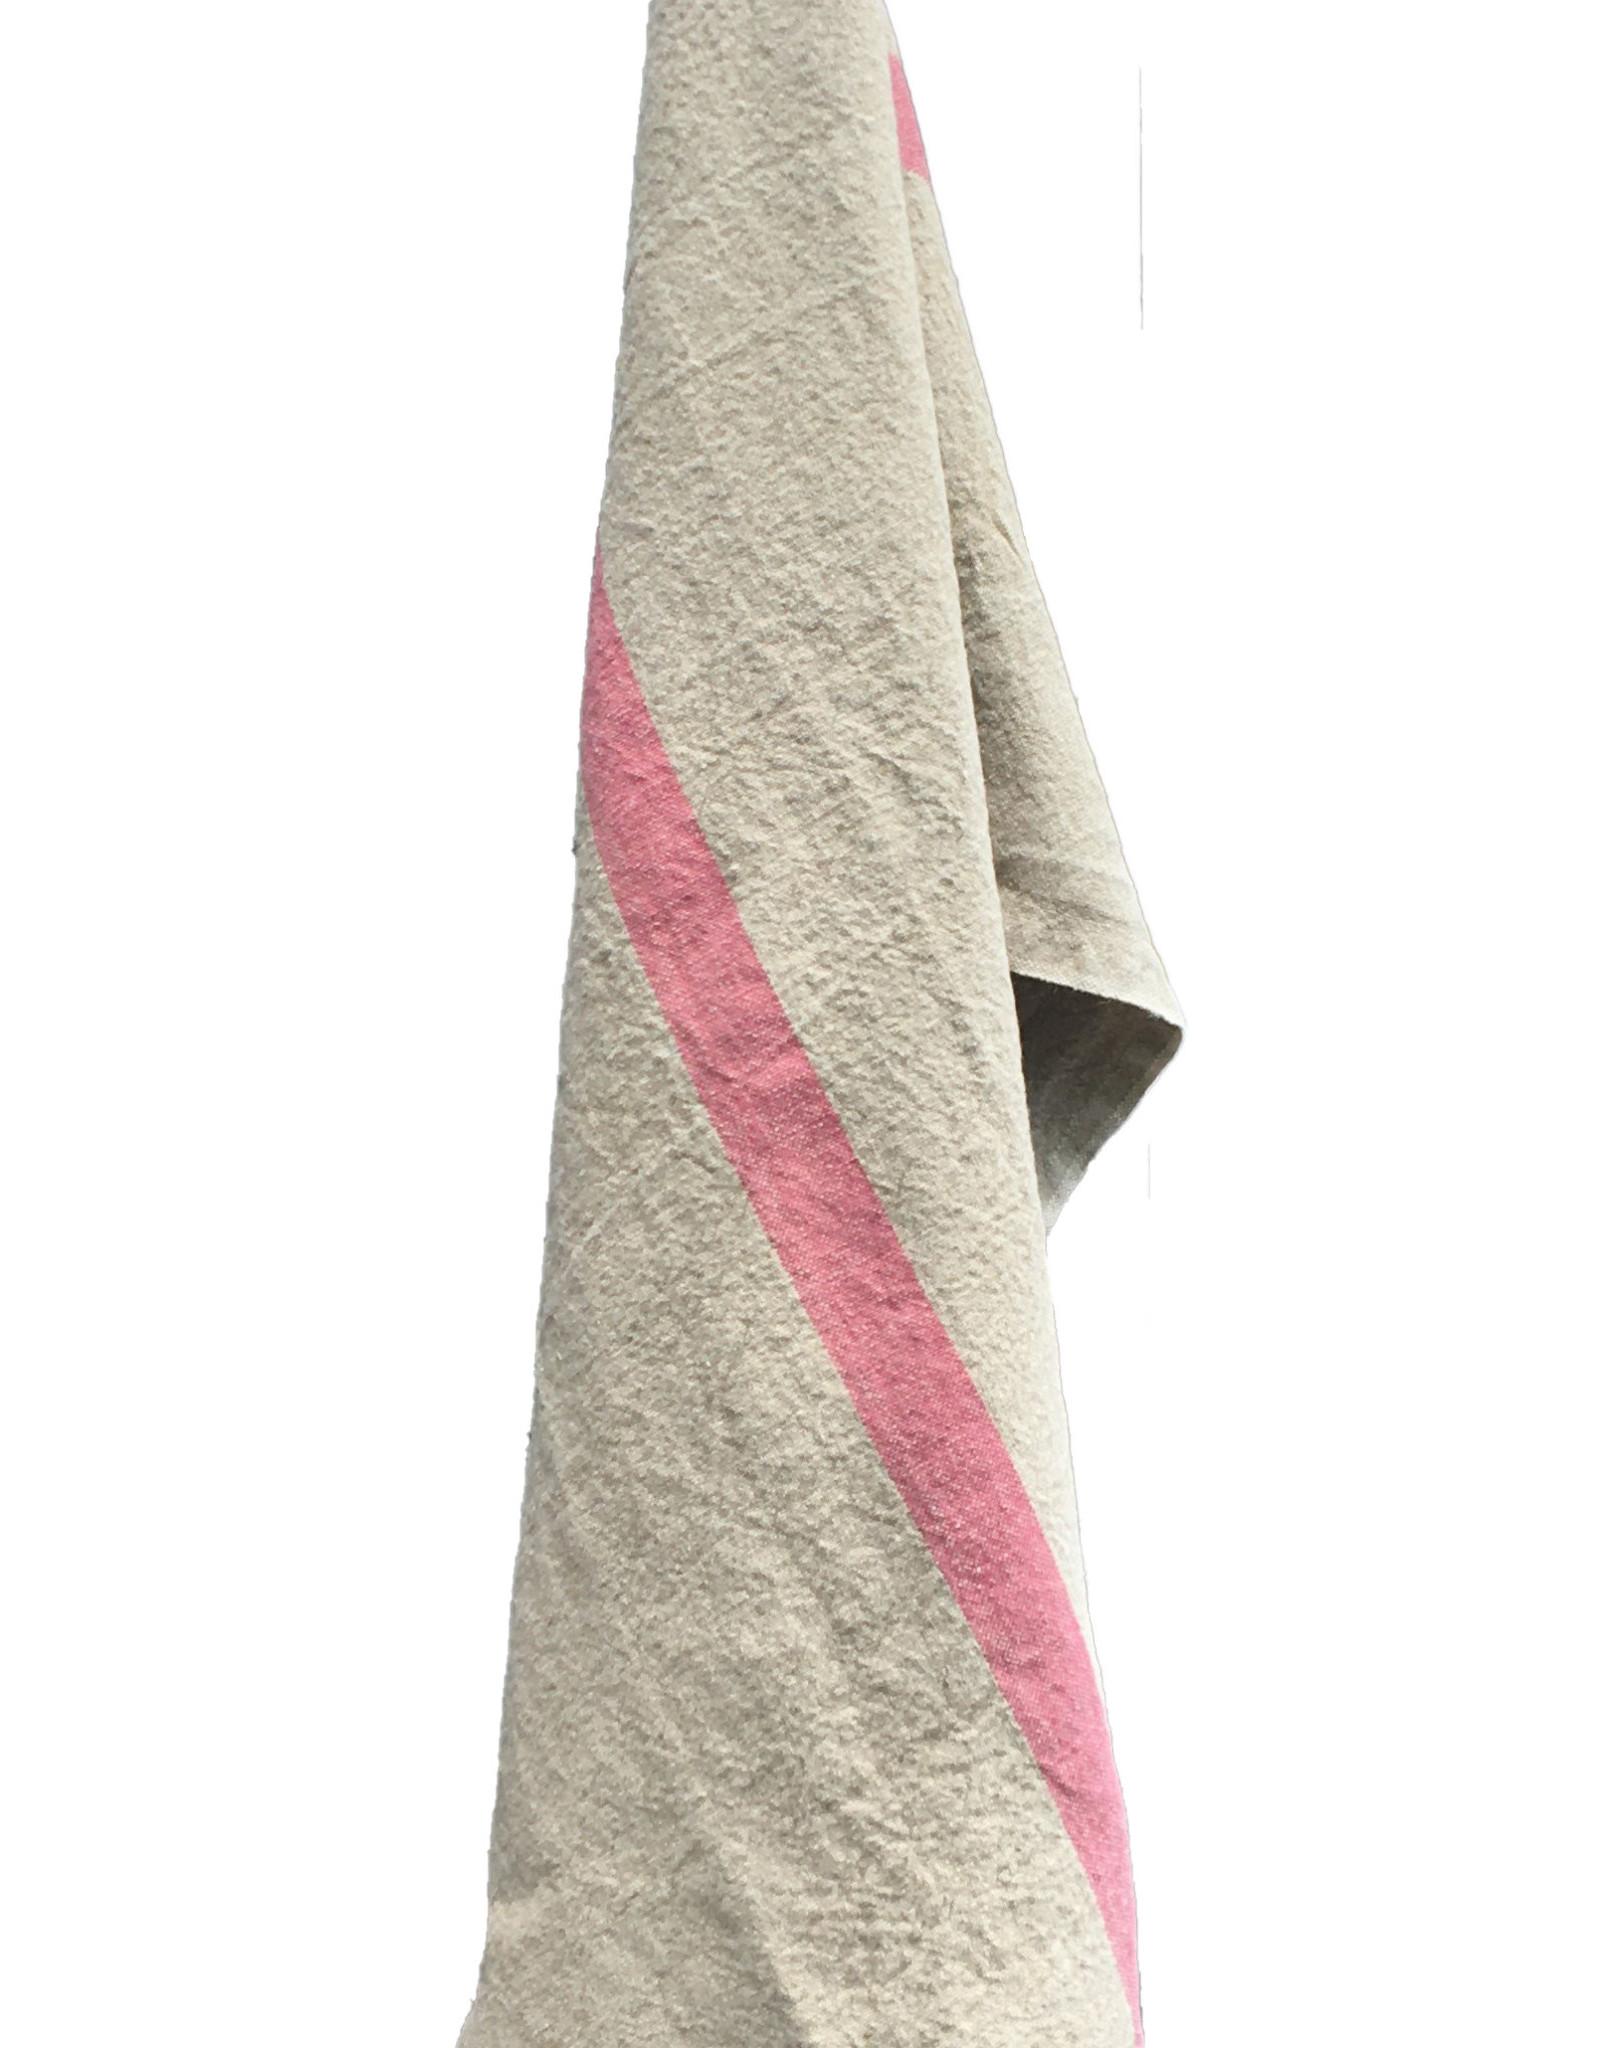 "Charvet Editions - Bistro Towel DouDou Natural/Rose - 18"" x 30"""